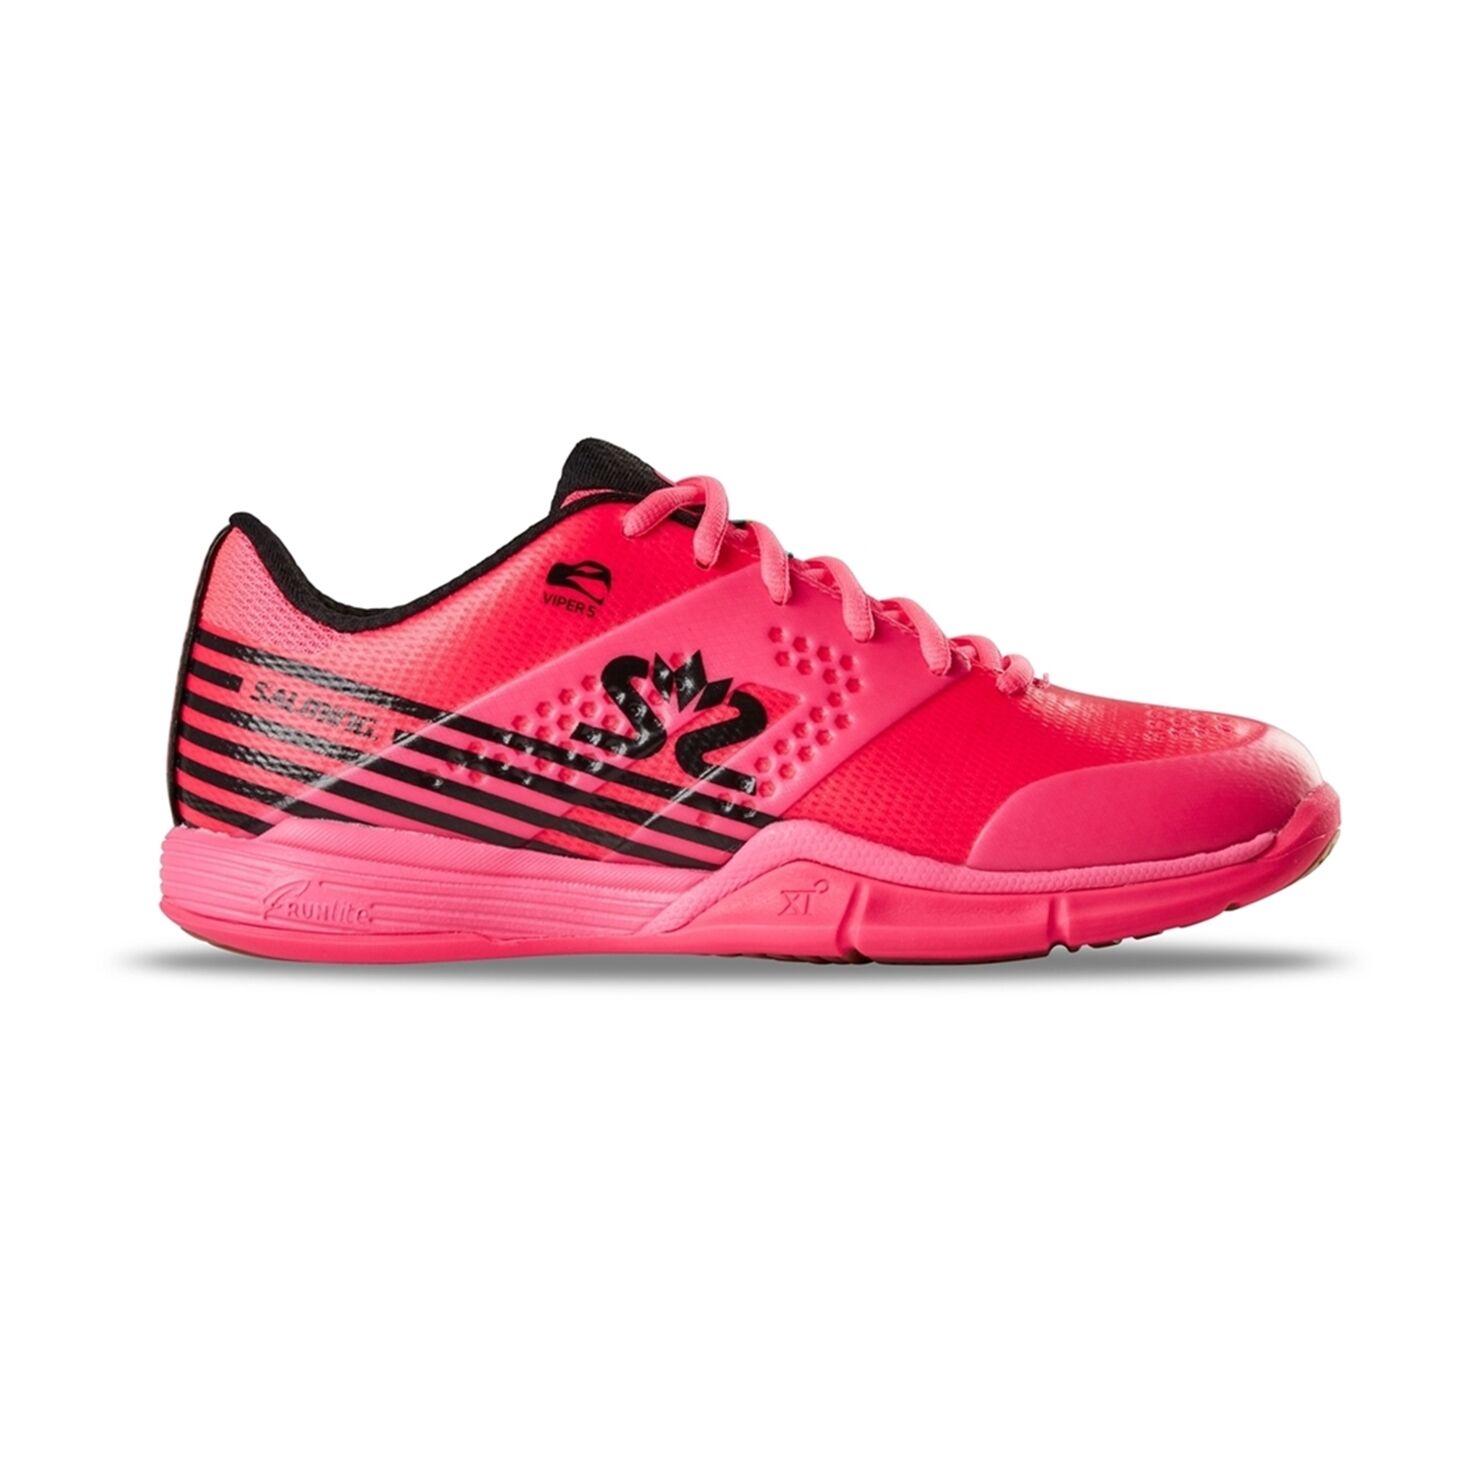 Salming Viper 5 Women Pink/Black 39 1/3